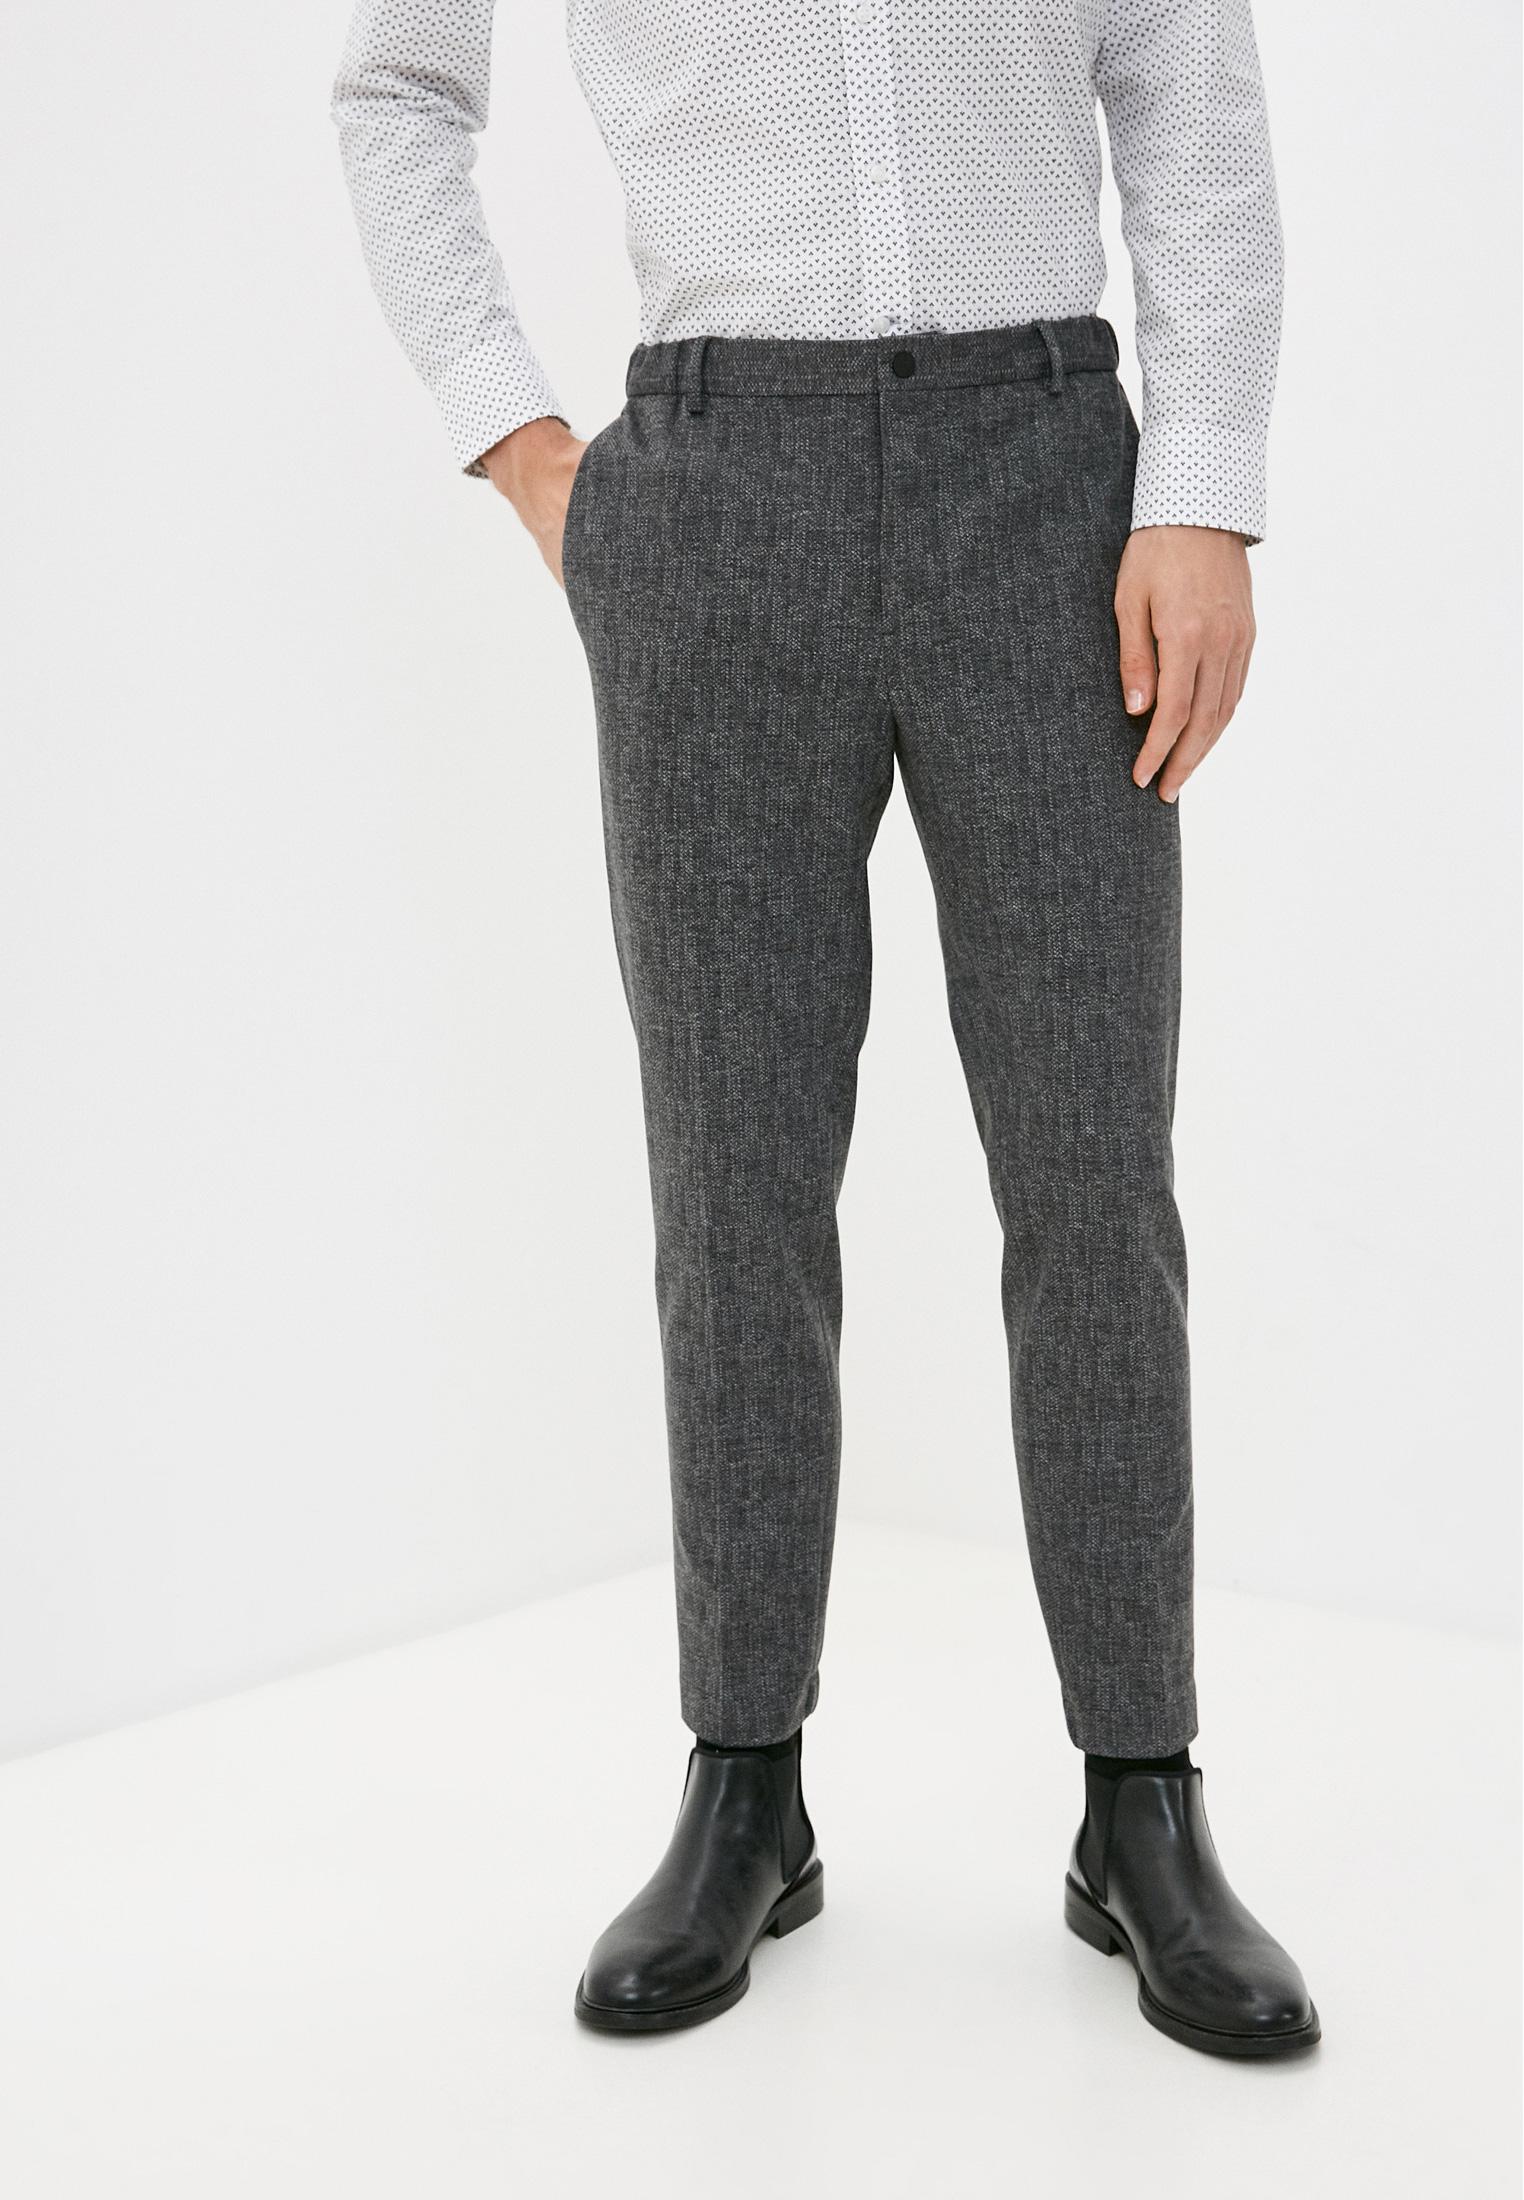 Мужские брюки Calvin Klein (Кельвин Кляйн) K10K106572